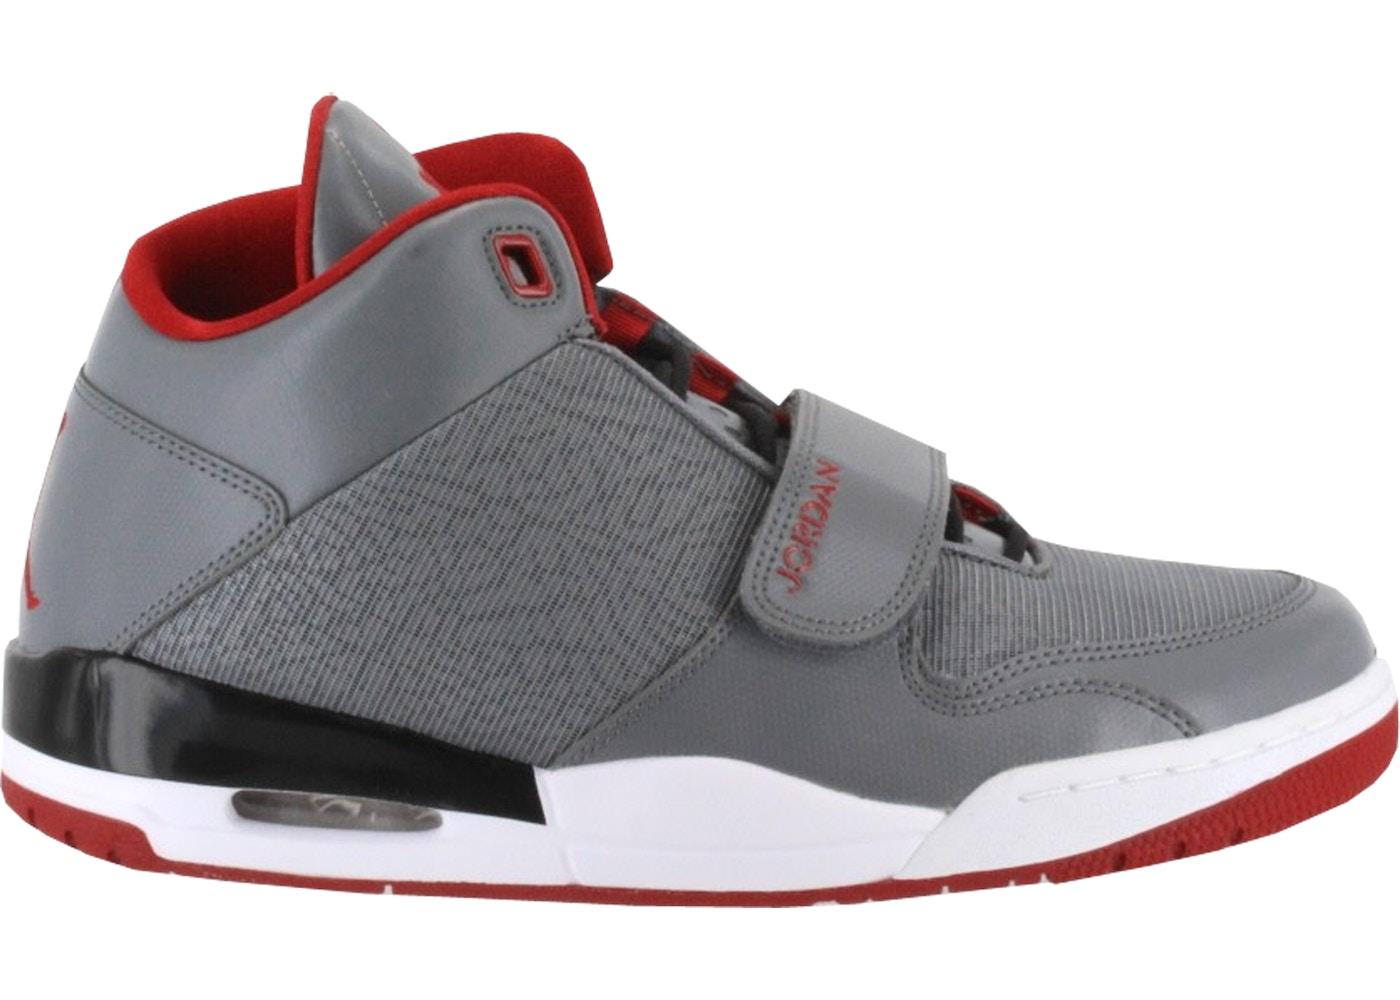 super popular sale online free delivery Jordan Flightclub 90's Cool Grey Gym Red - 602661-022